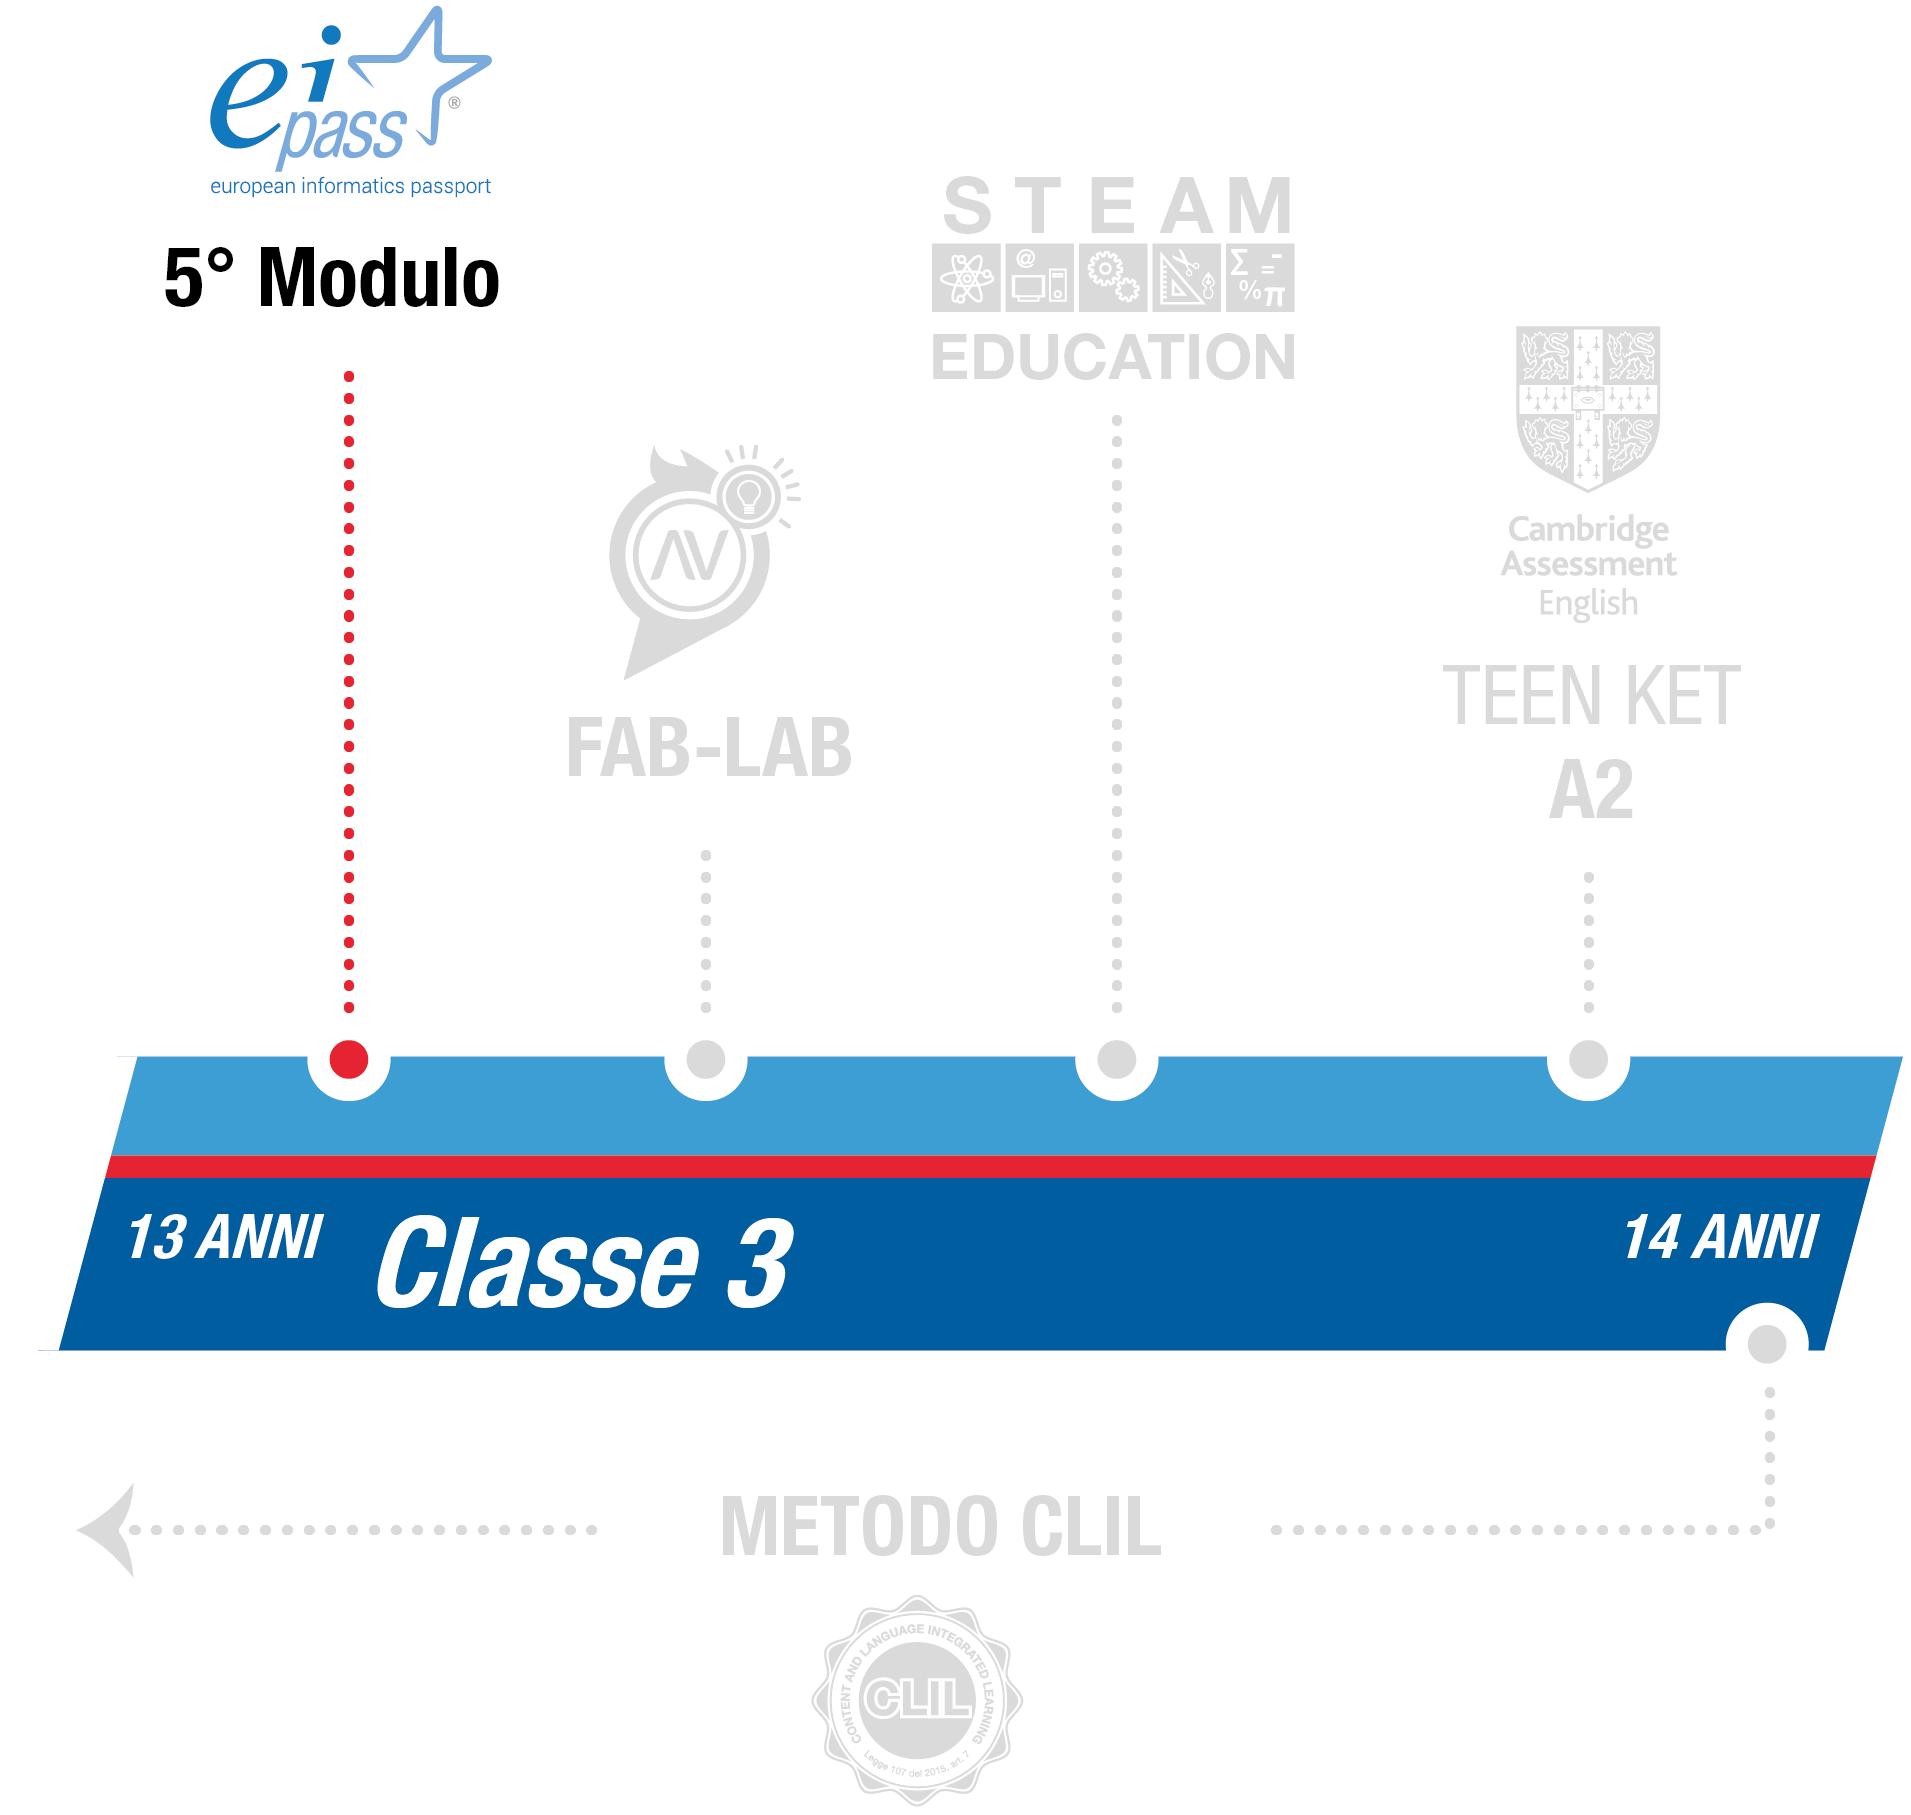 istituto-nobile-middle-school-eipass-3anno